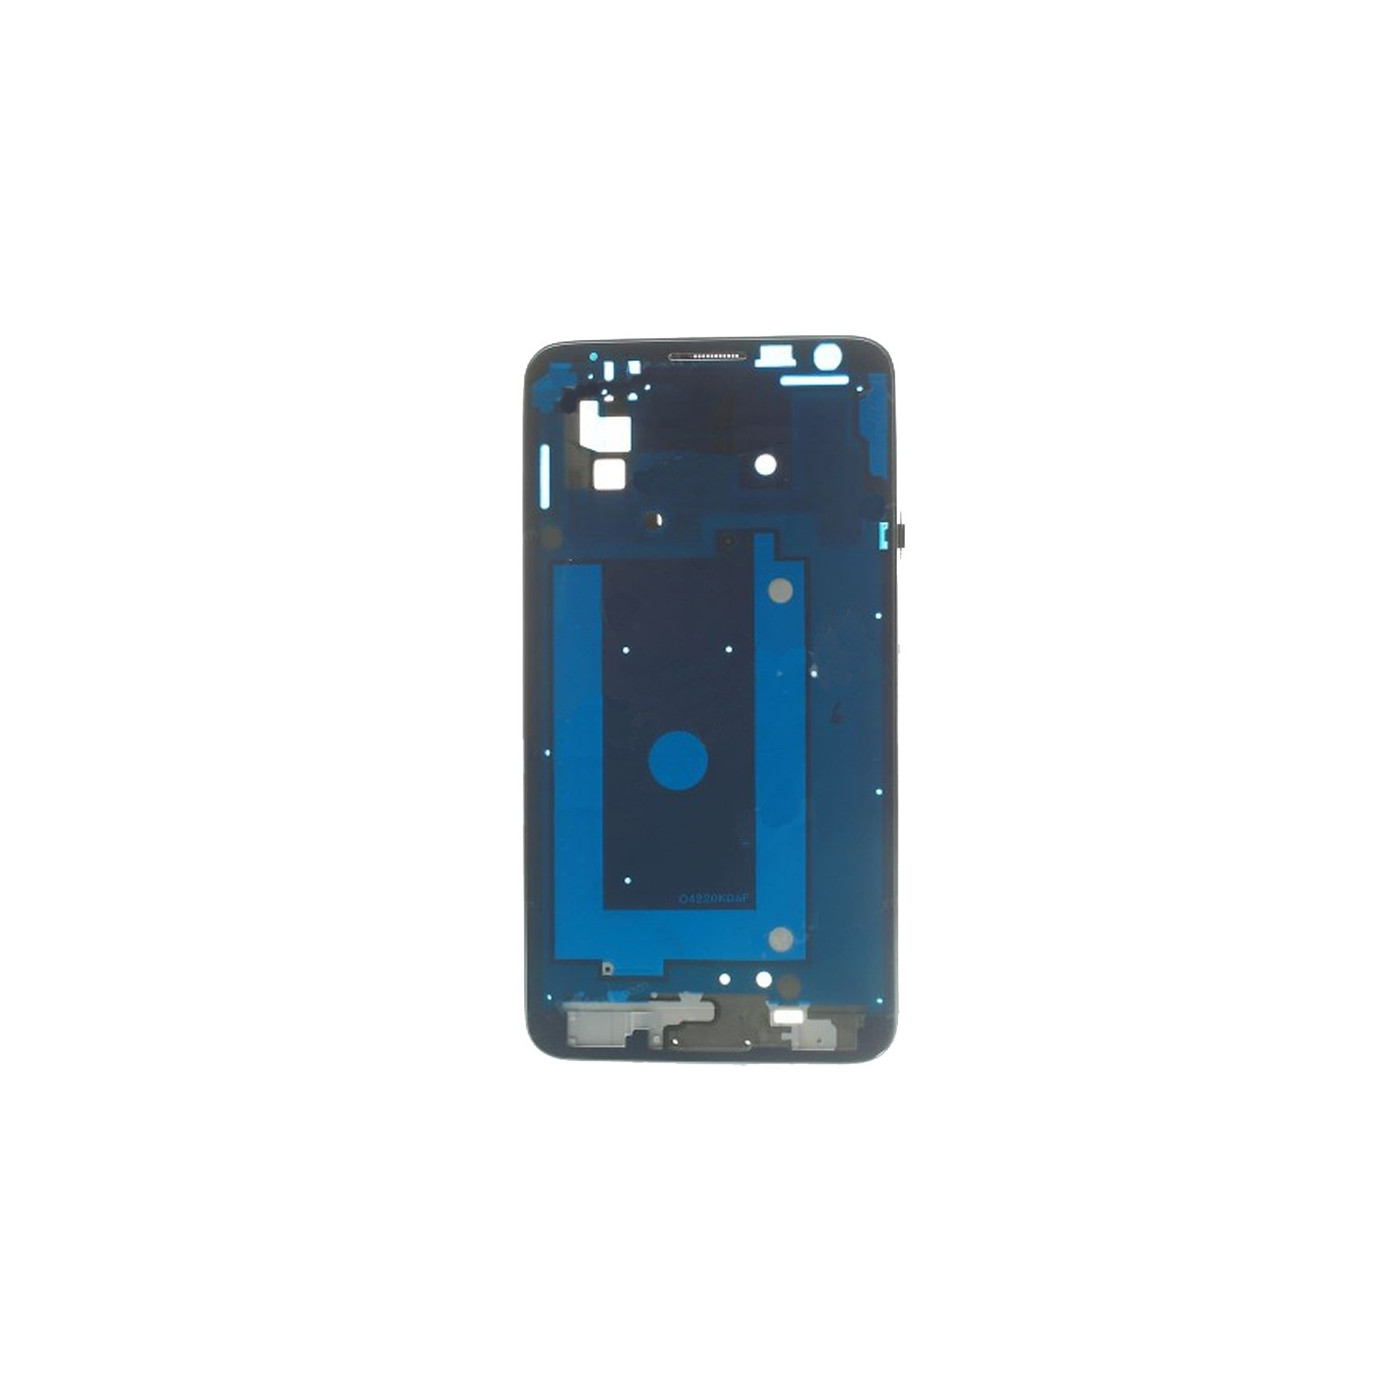 Cadre Cadre Coque Samsung Galaxy Note 3 Neo N7505 Cadre Cadre Argent